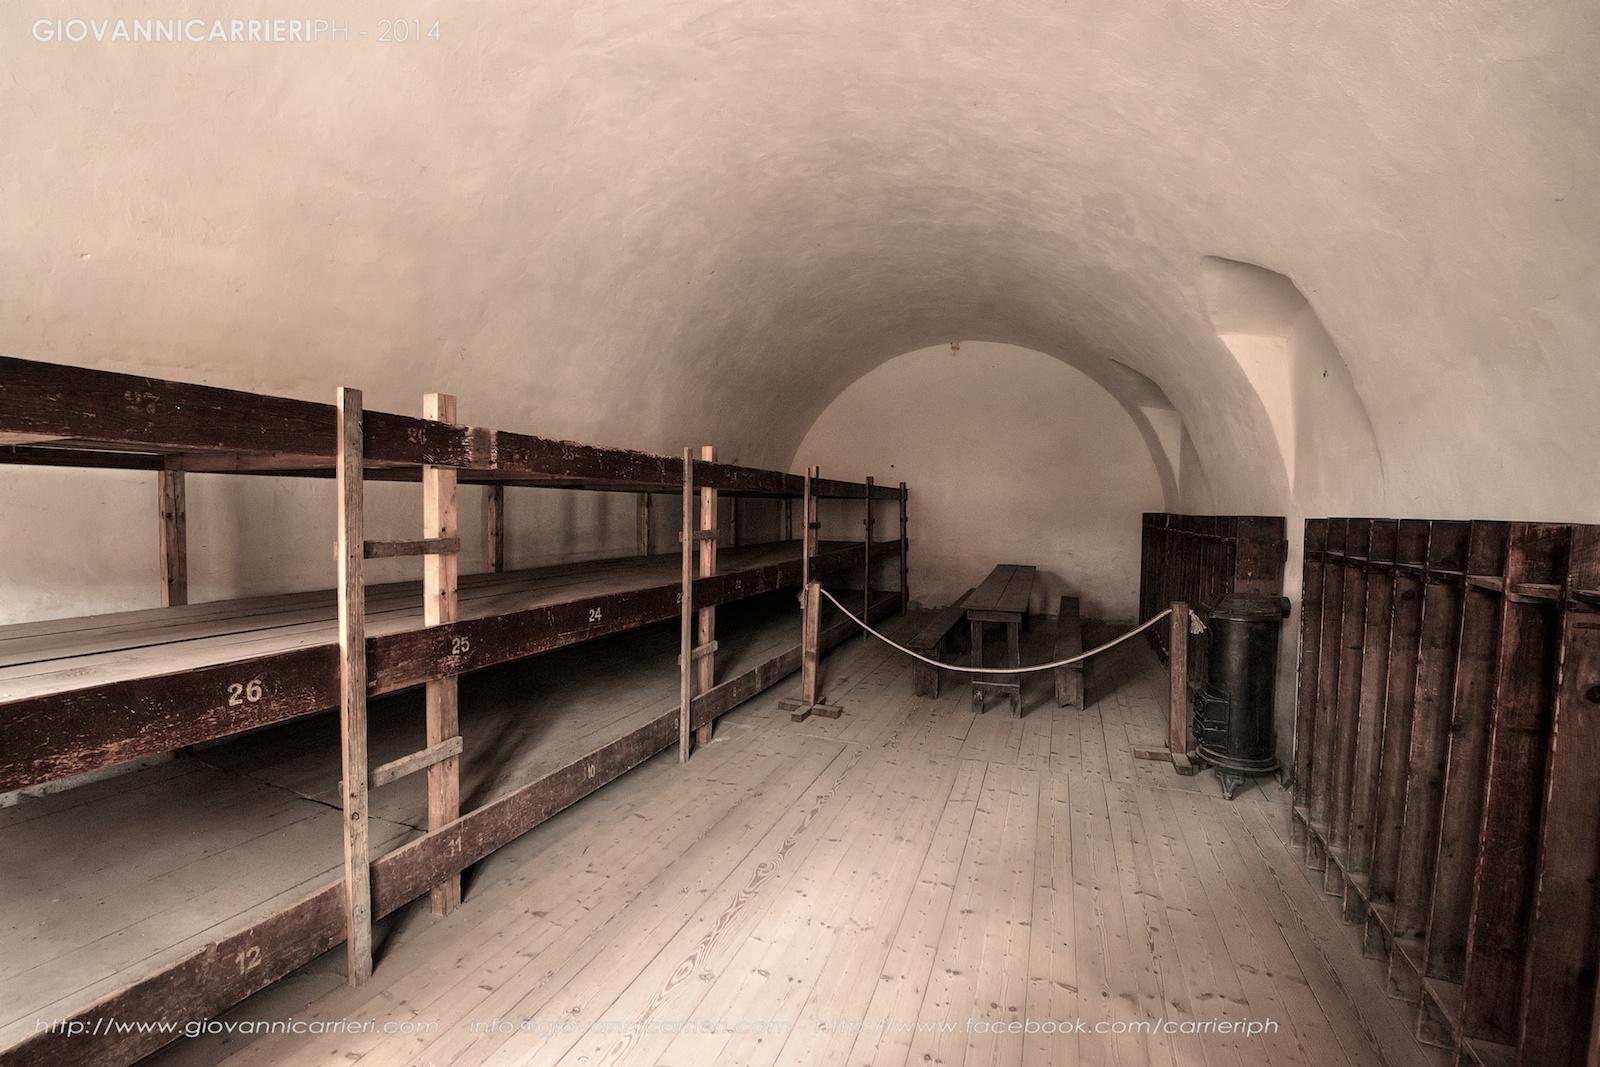 Le celle comuni del Blocco A - Theresienstadt